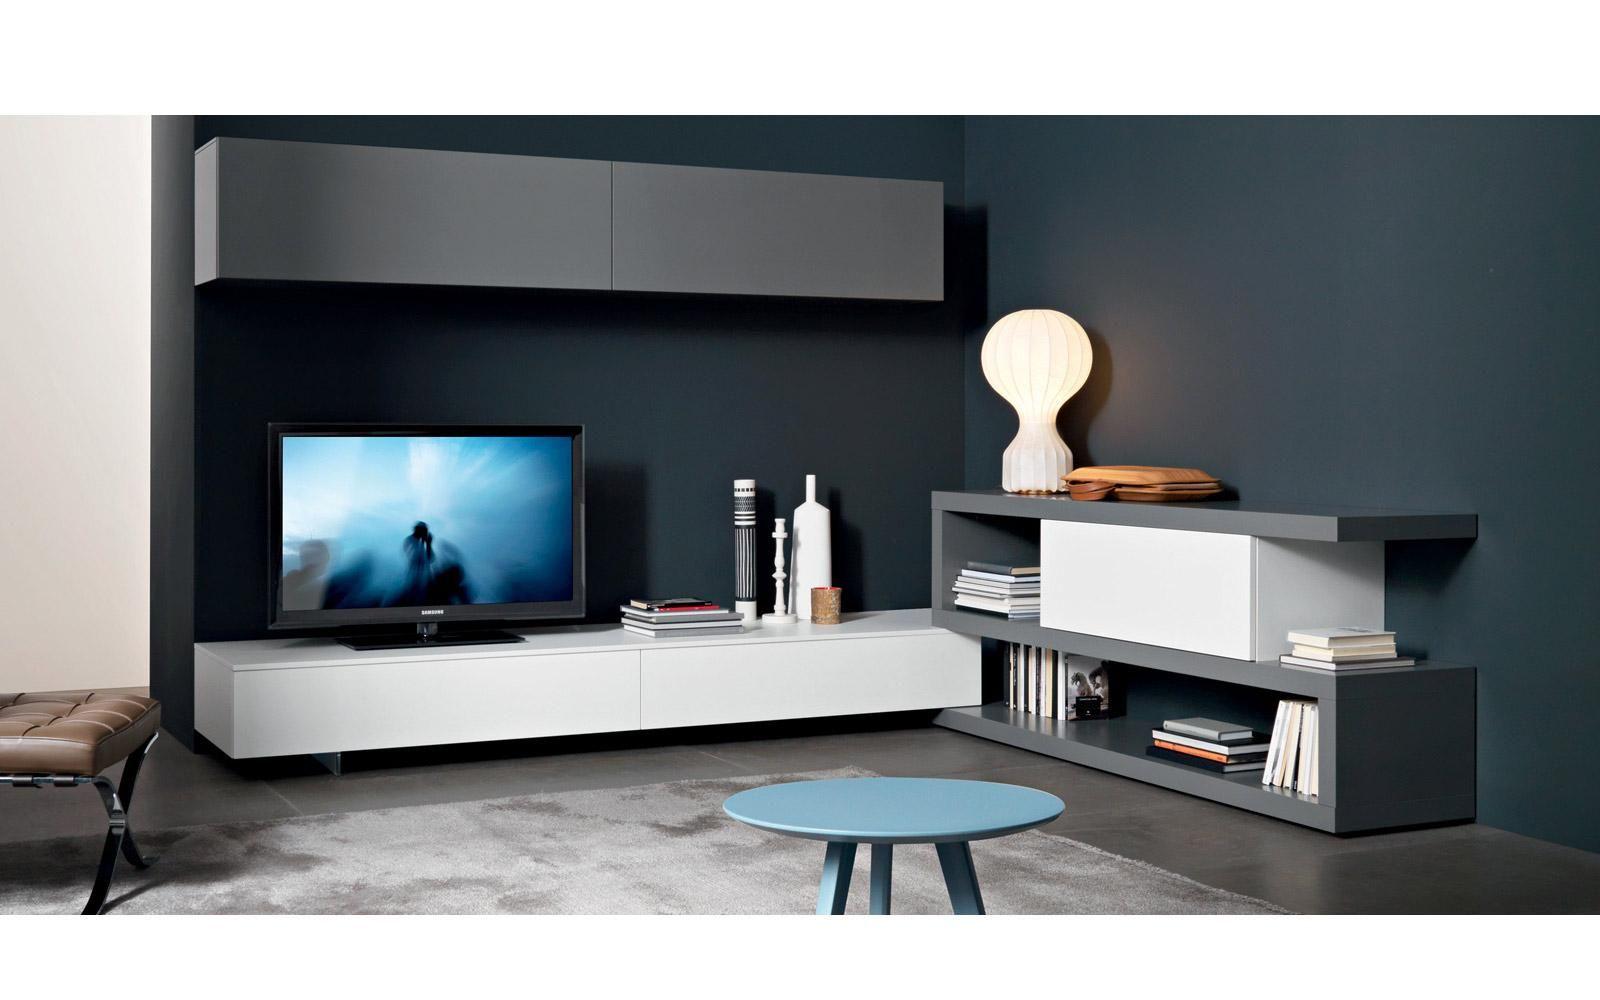 TV Wand Lampo L8-83A Eck Lowboard  Wohnen, Modernes wohnen